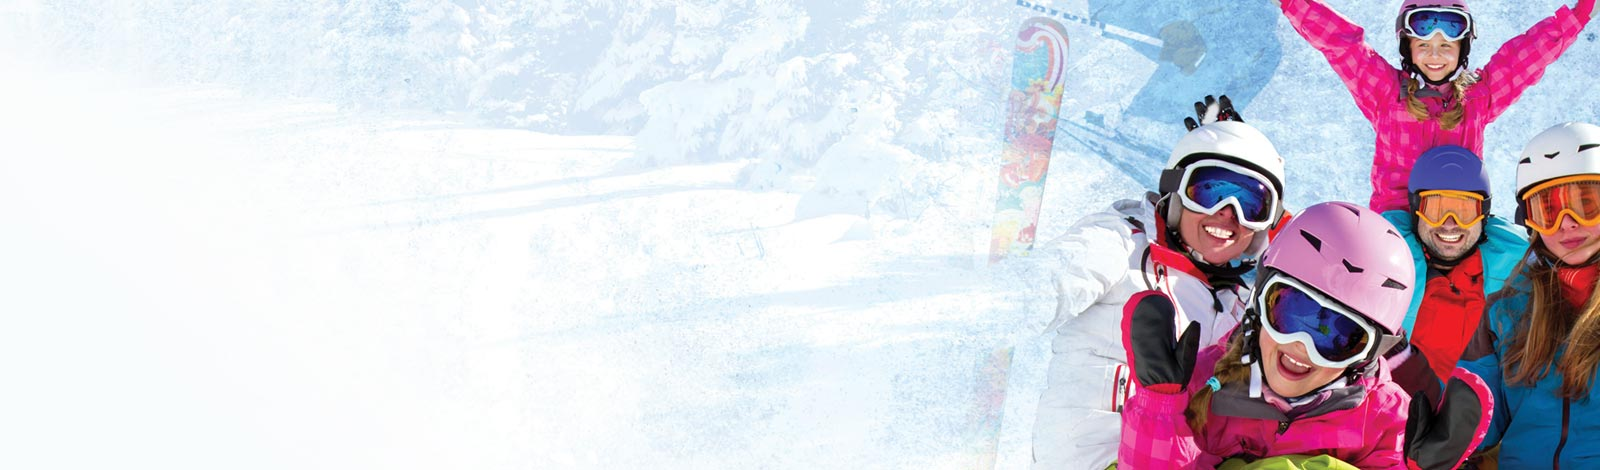 Club de ski Vallée-Jonction